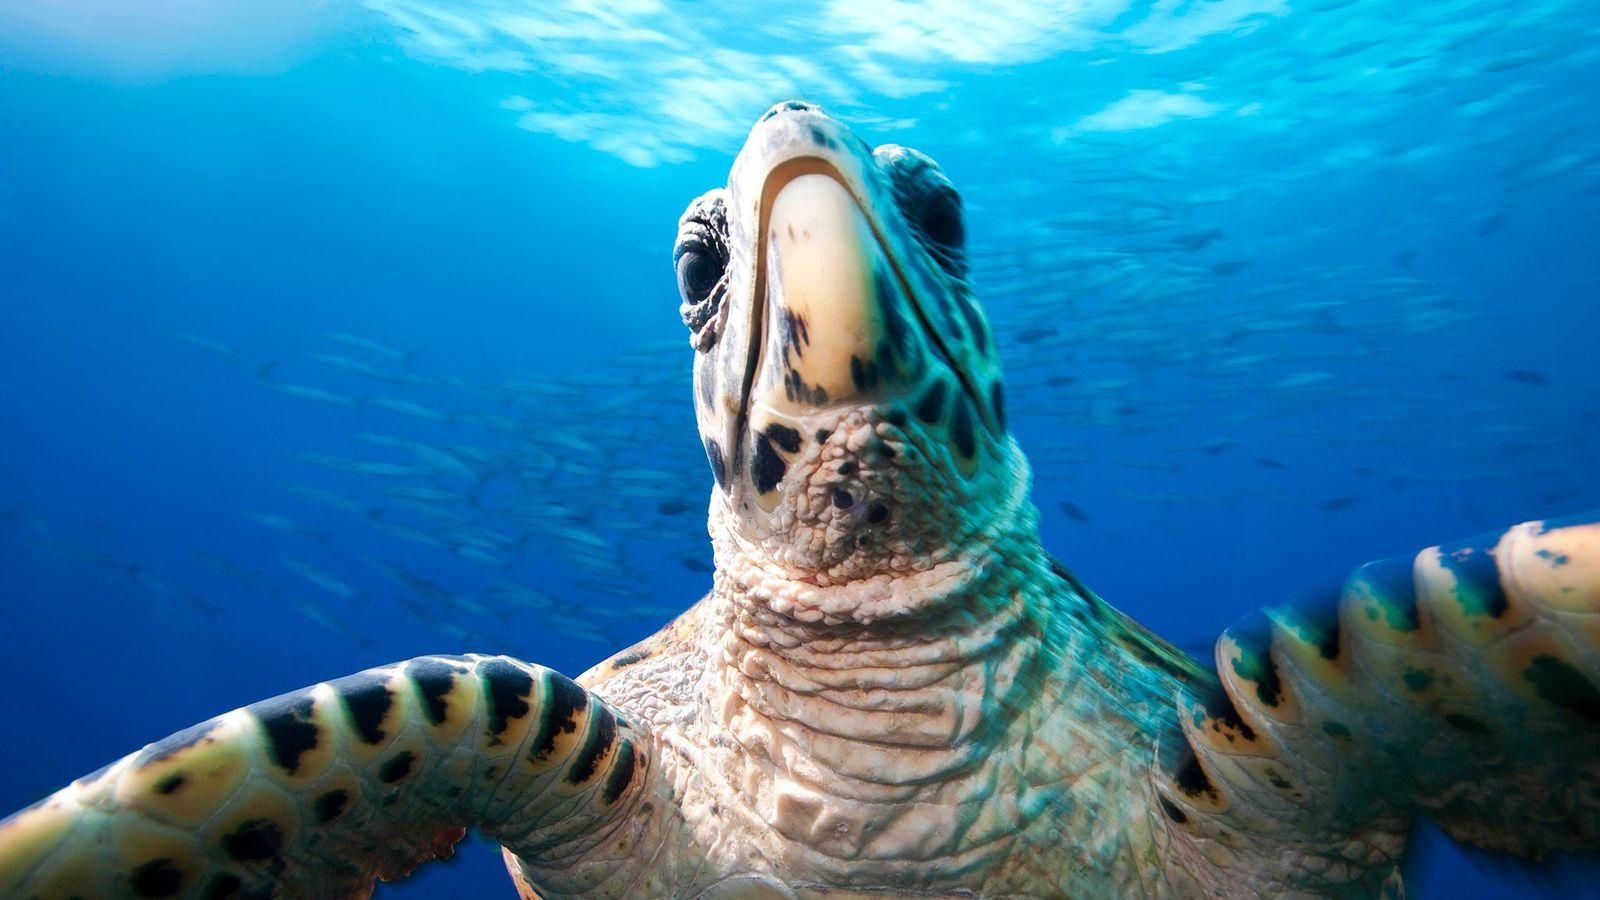 A hawksbill sea turtle, Eretmochelys imbricata, at Jayne's Gulley in Kimbe bay Papua New Guinea.